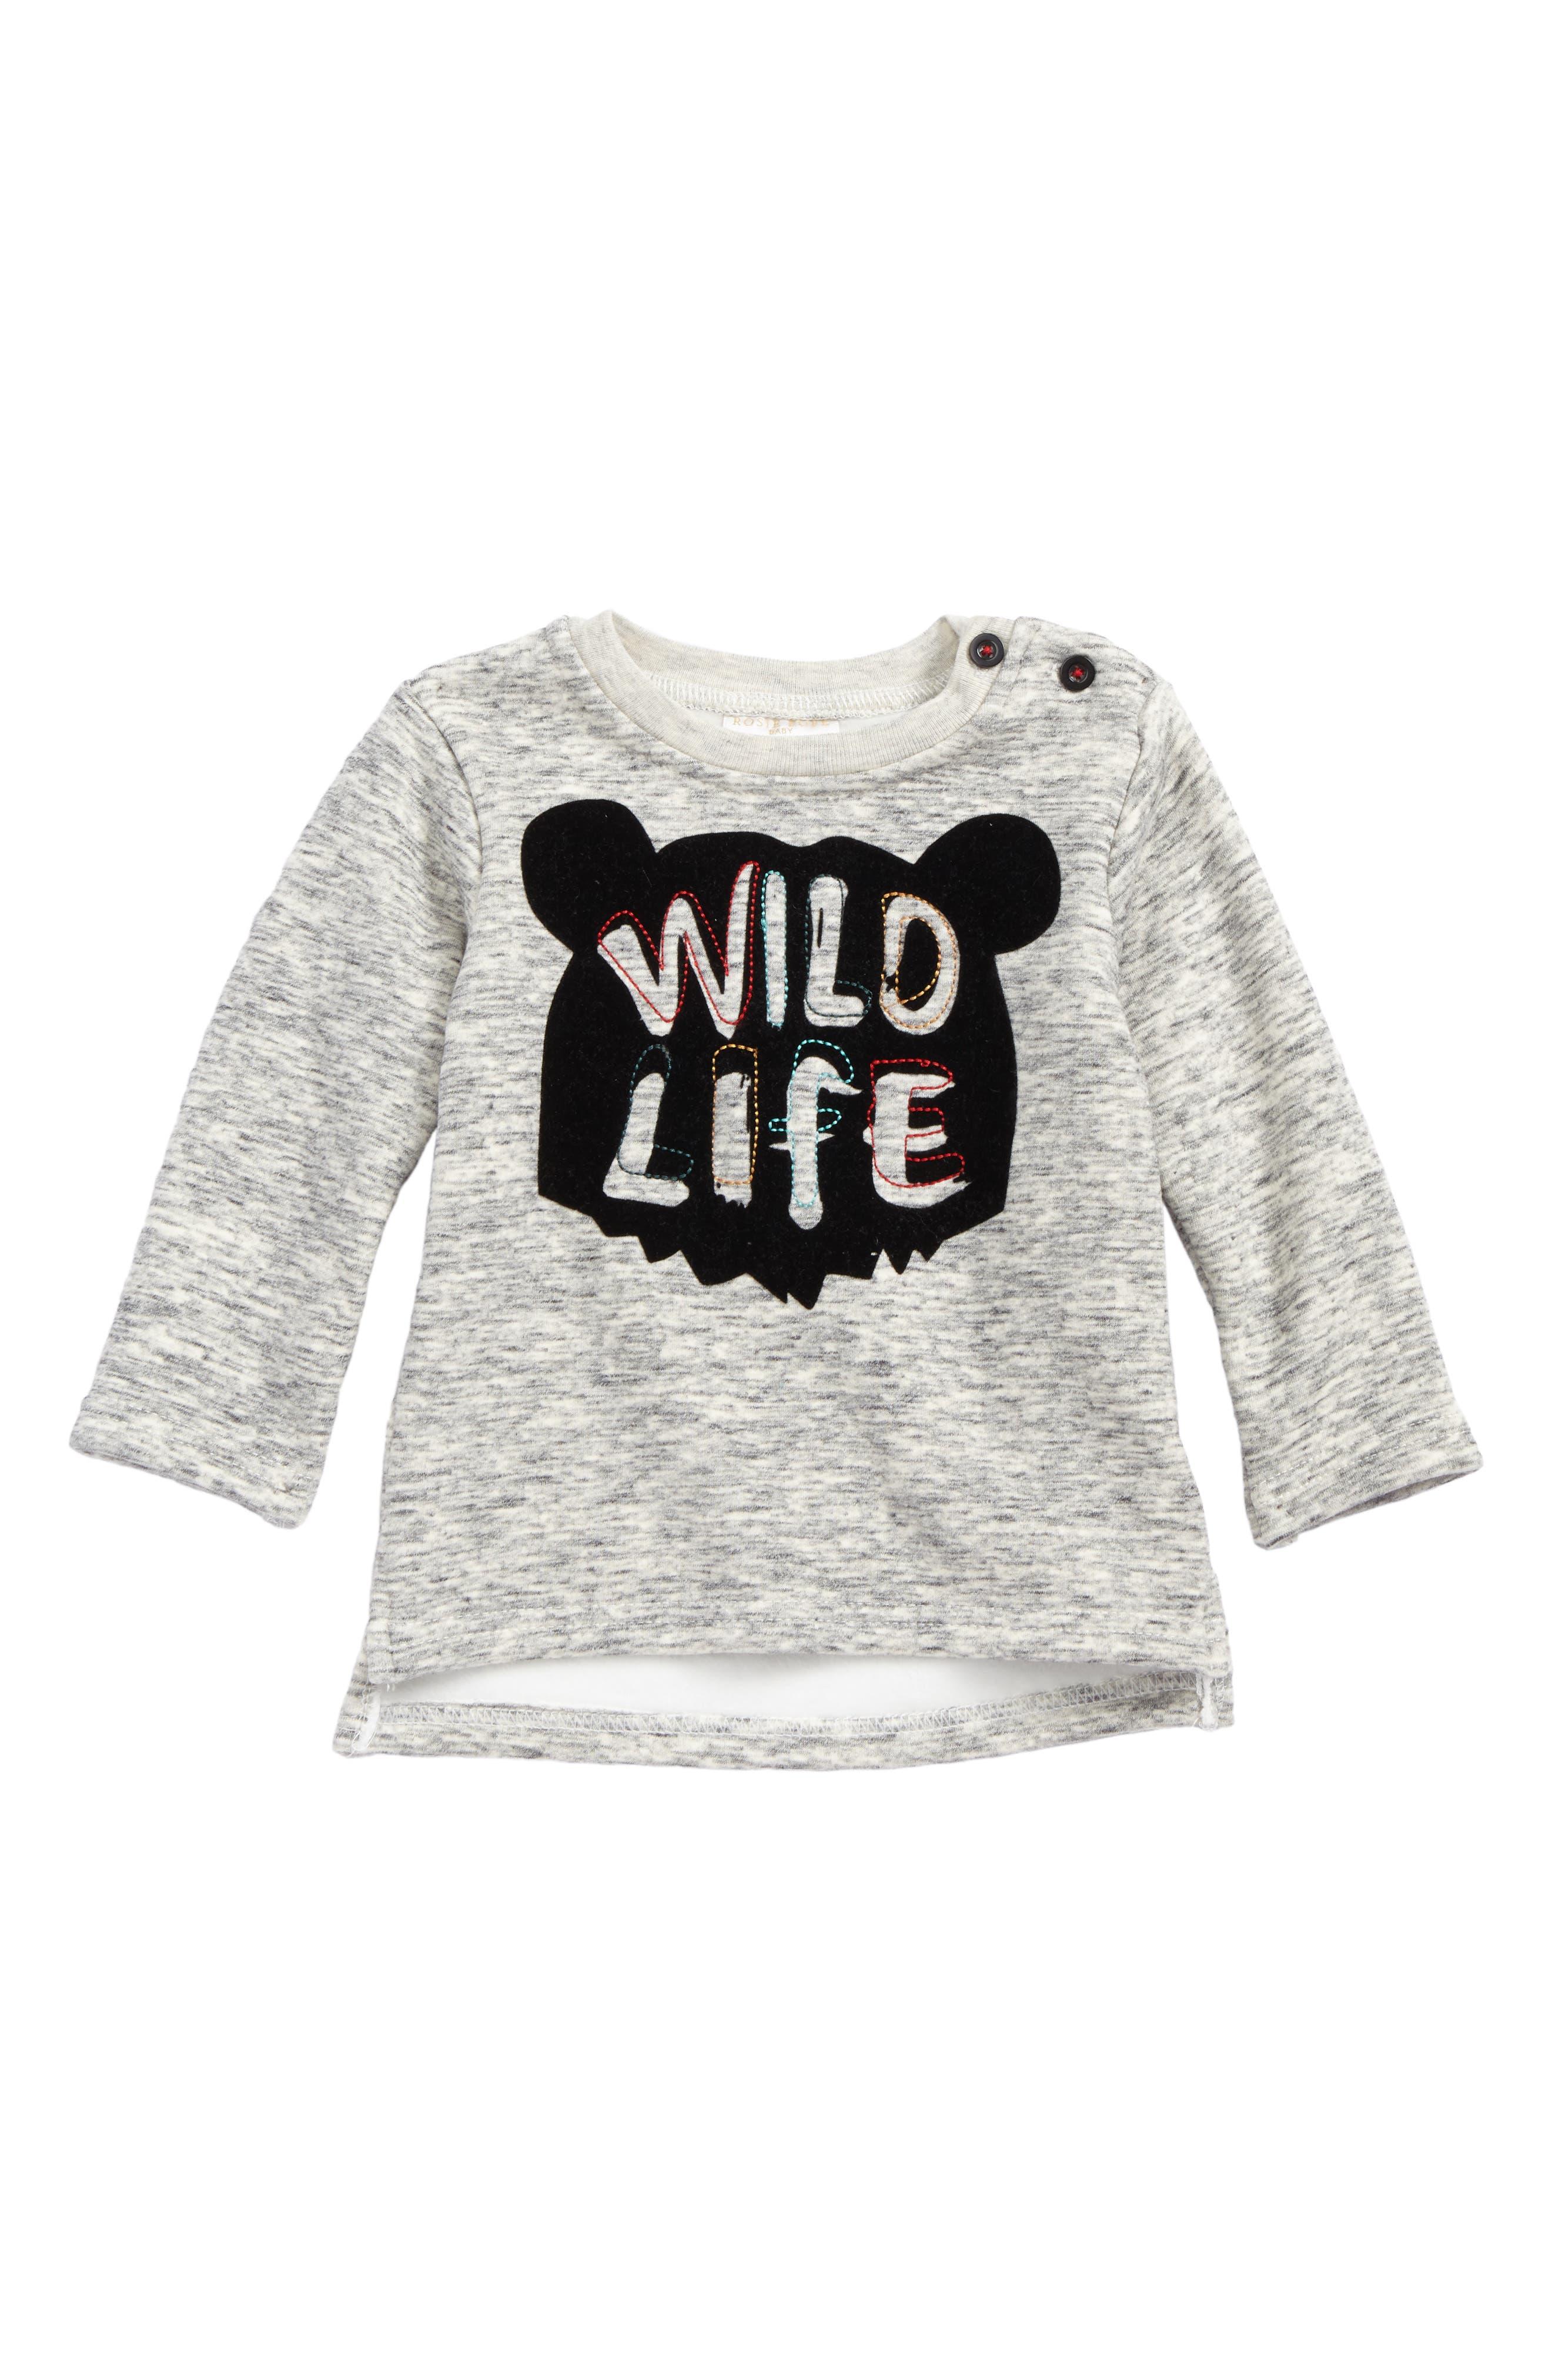 Rosie Pope Wild Life Sweatshirt (Baby Boys)